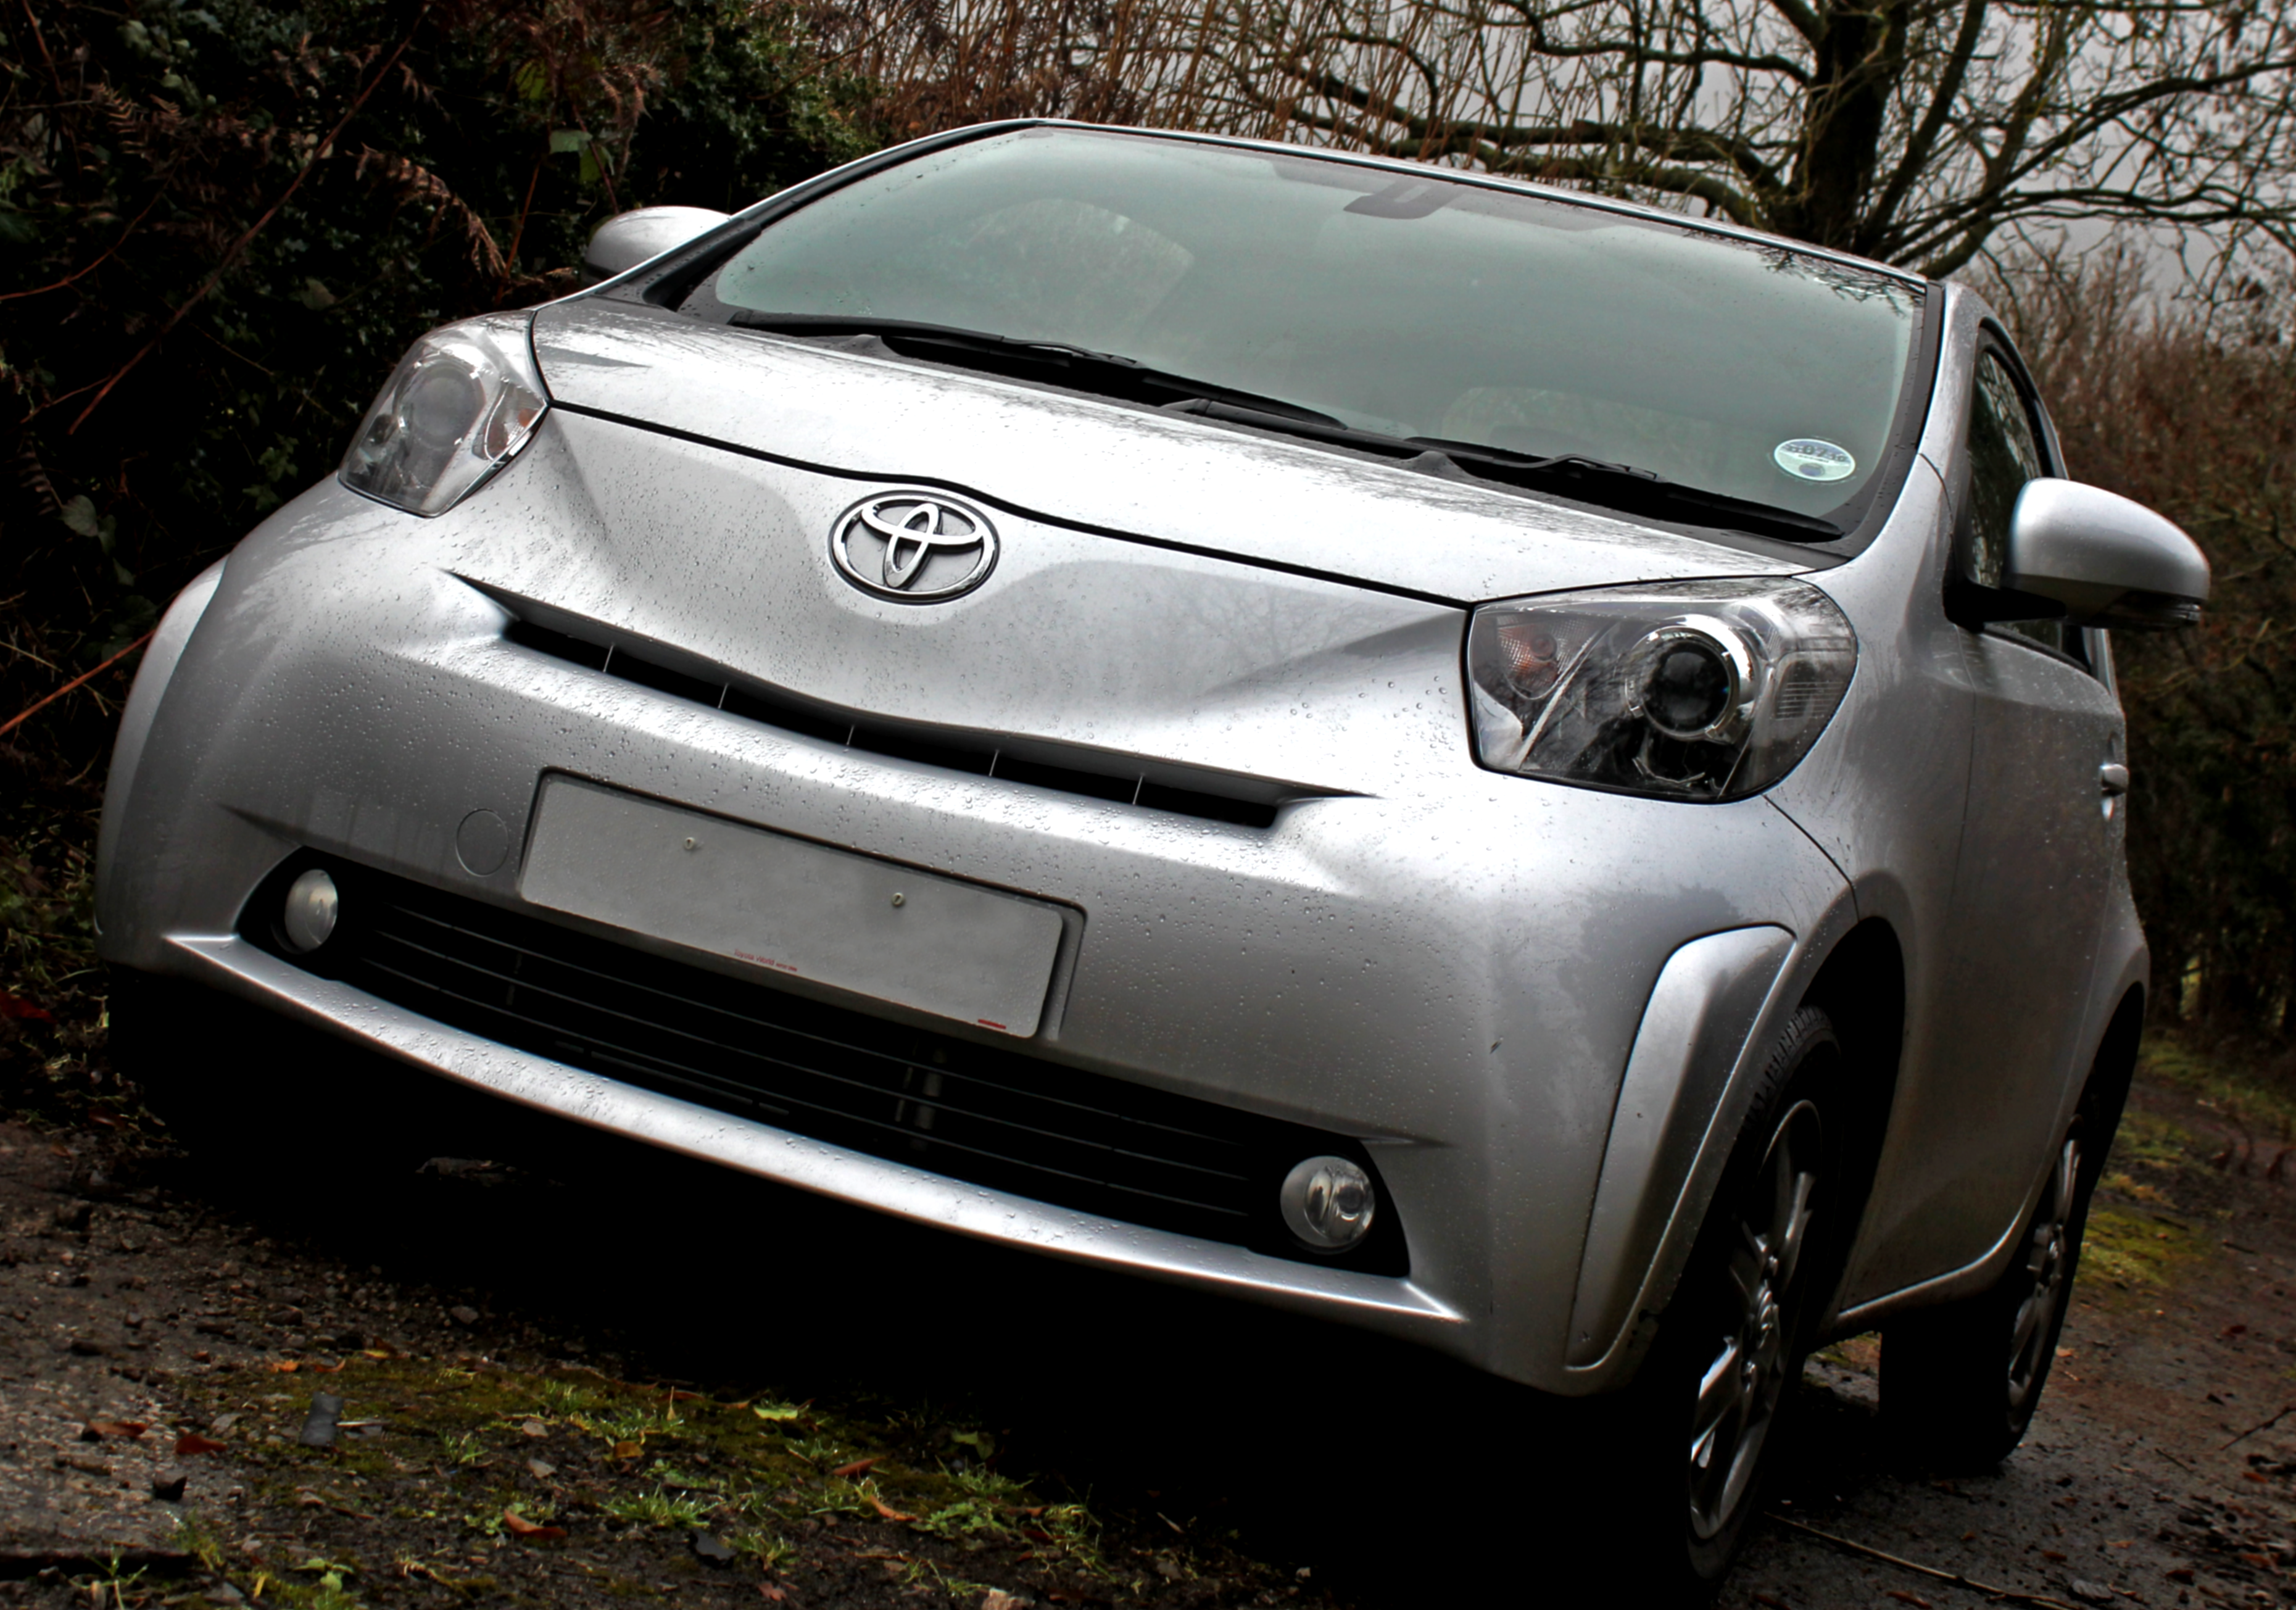 Tim Ford Toyota iQ